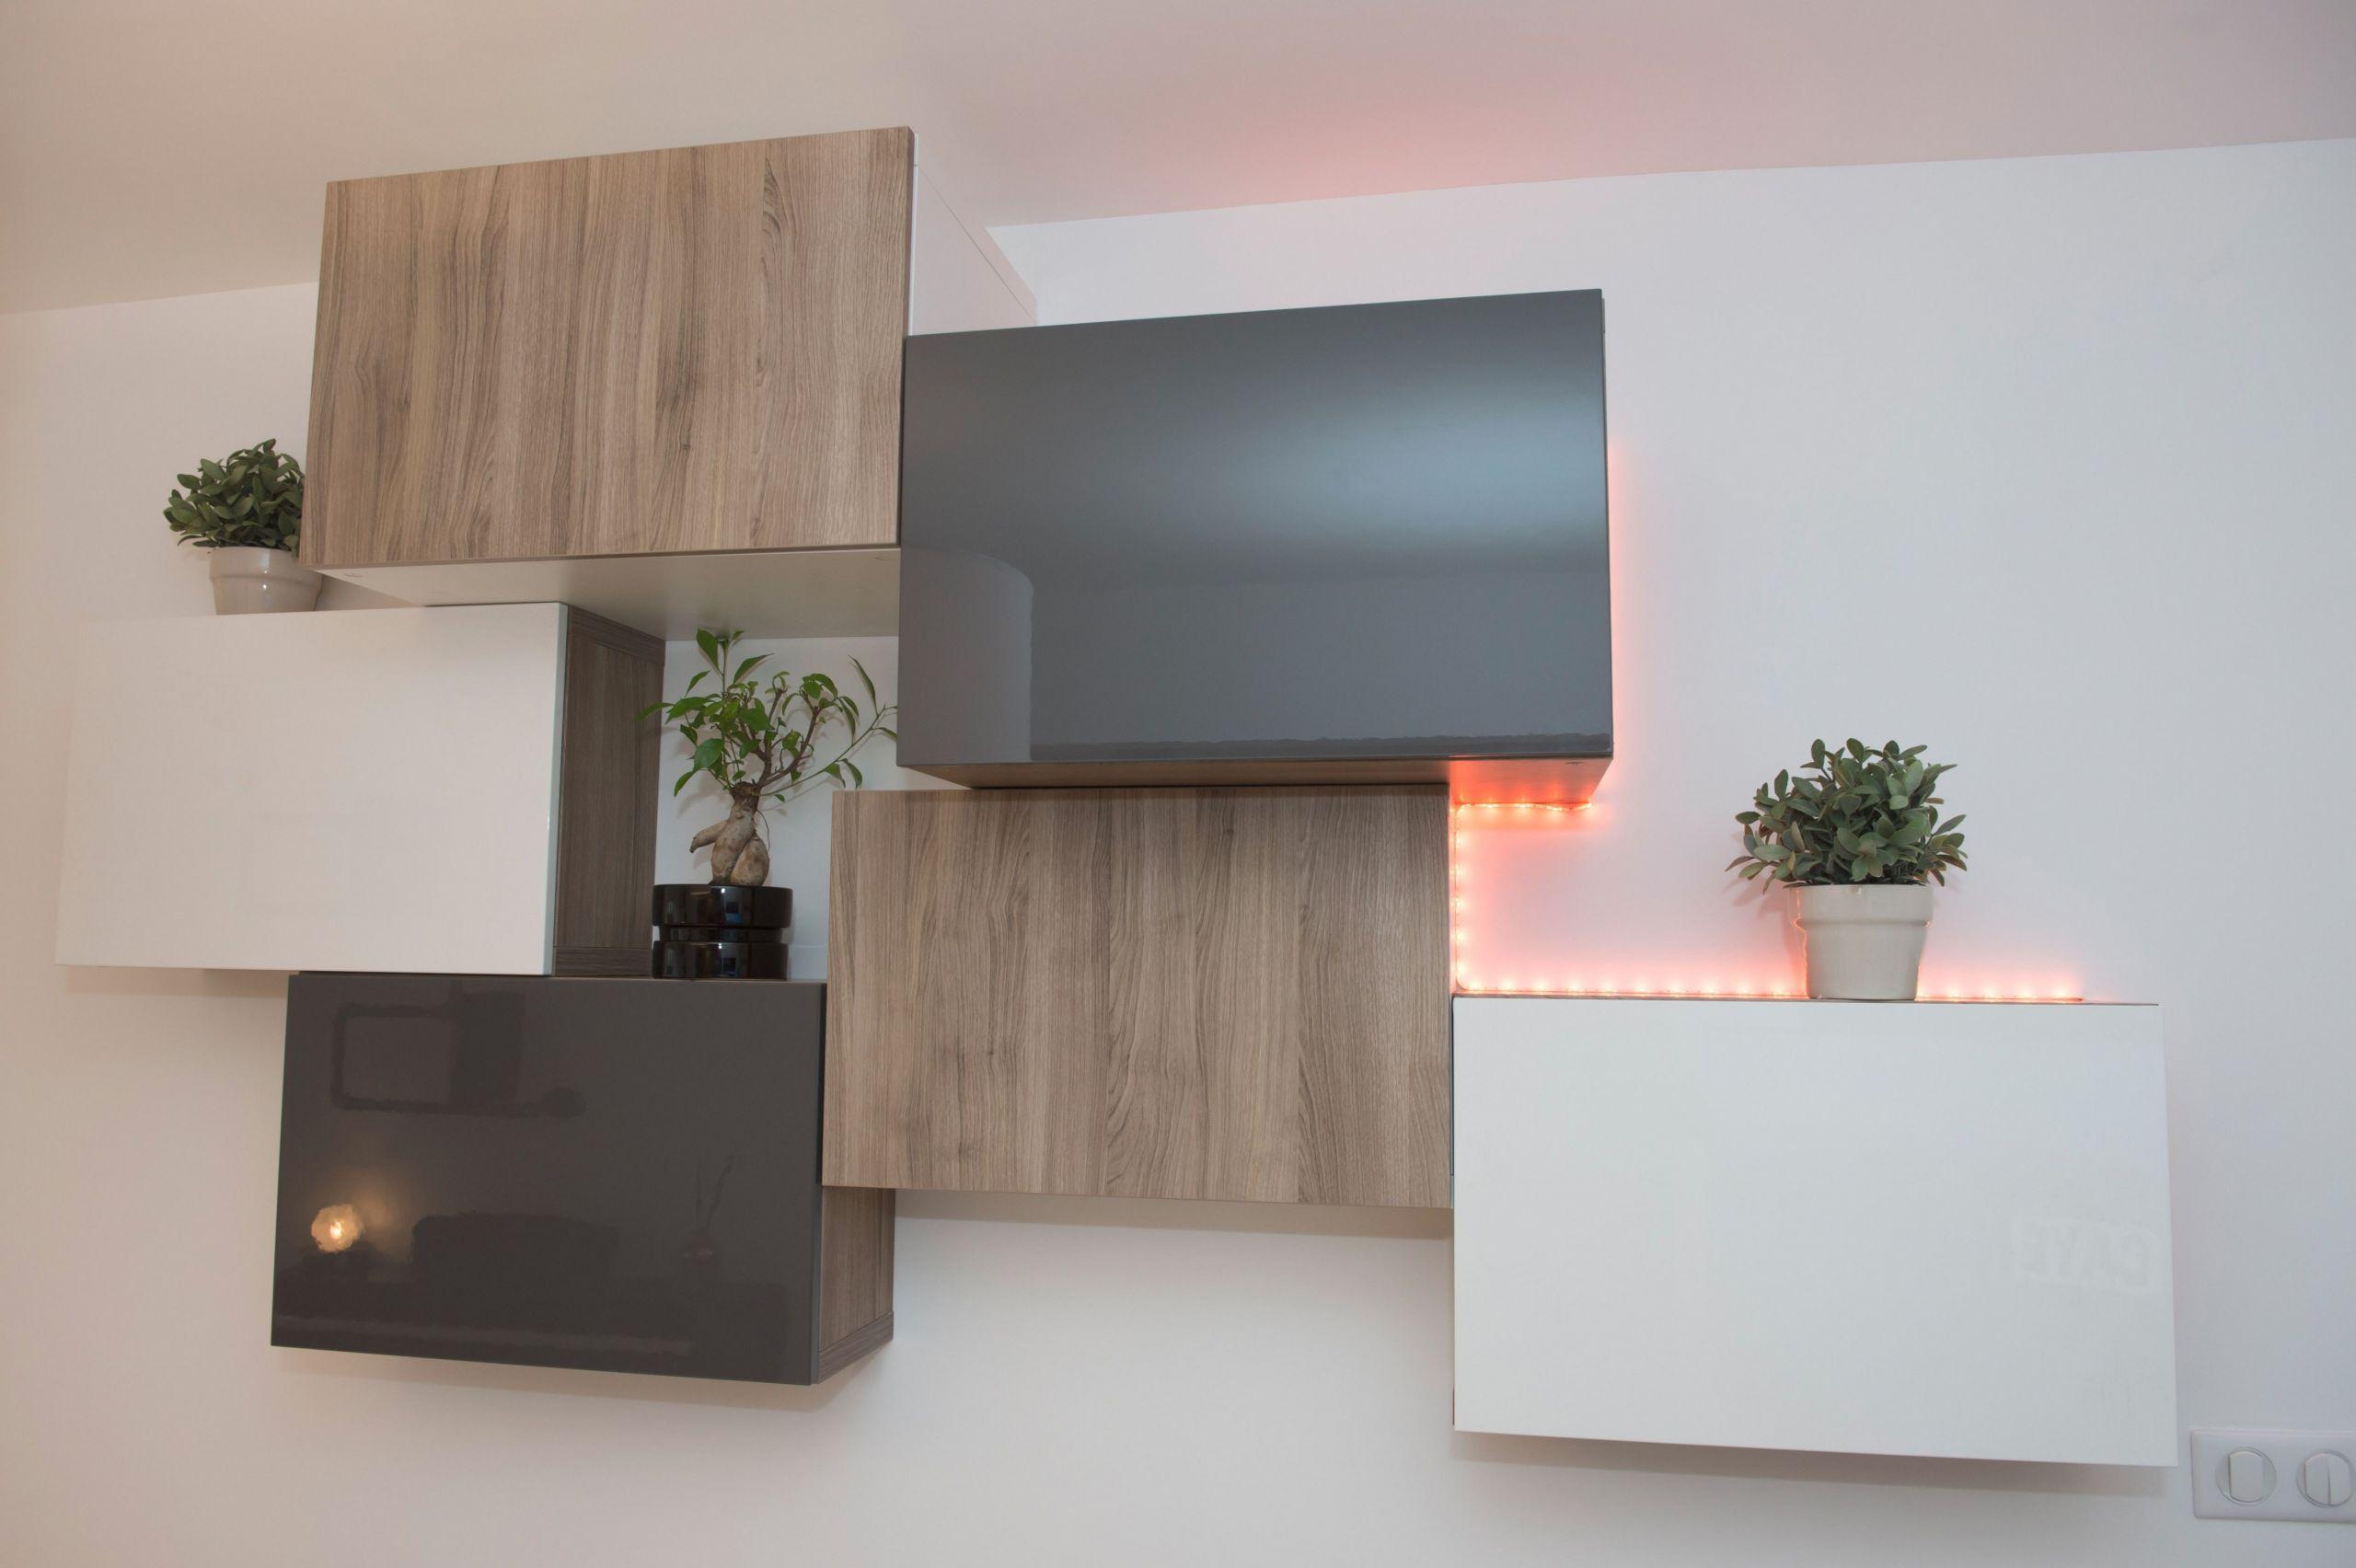 meuble tv but blanc meuble tele but meuble tv angle but meuble tv bois origins meuble 0d of meuble tv but blanc